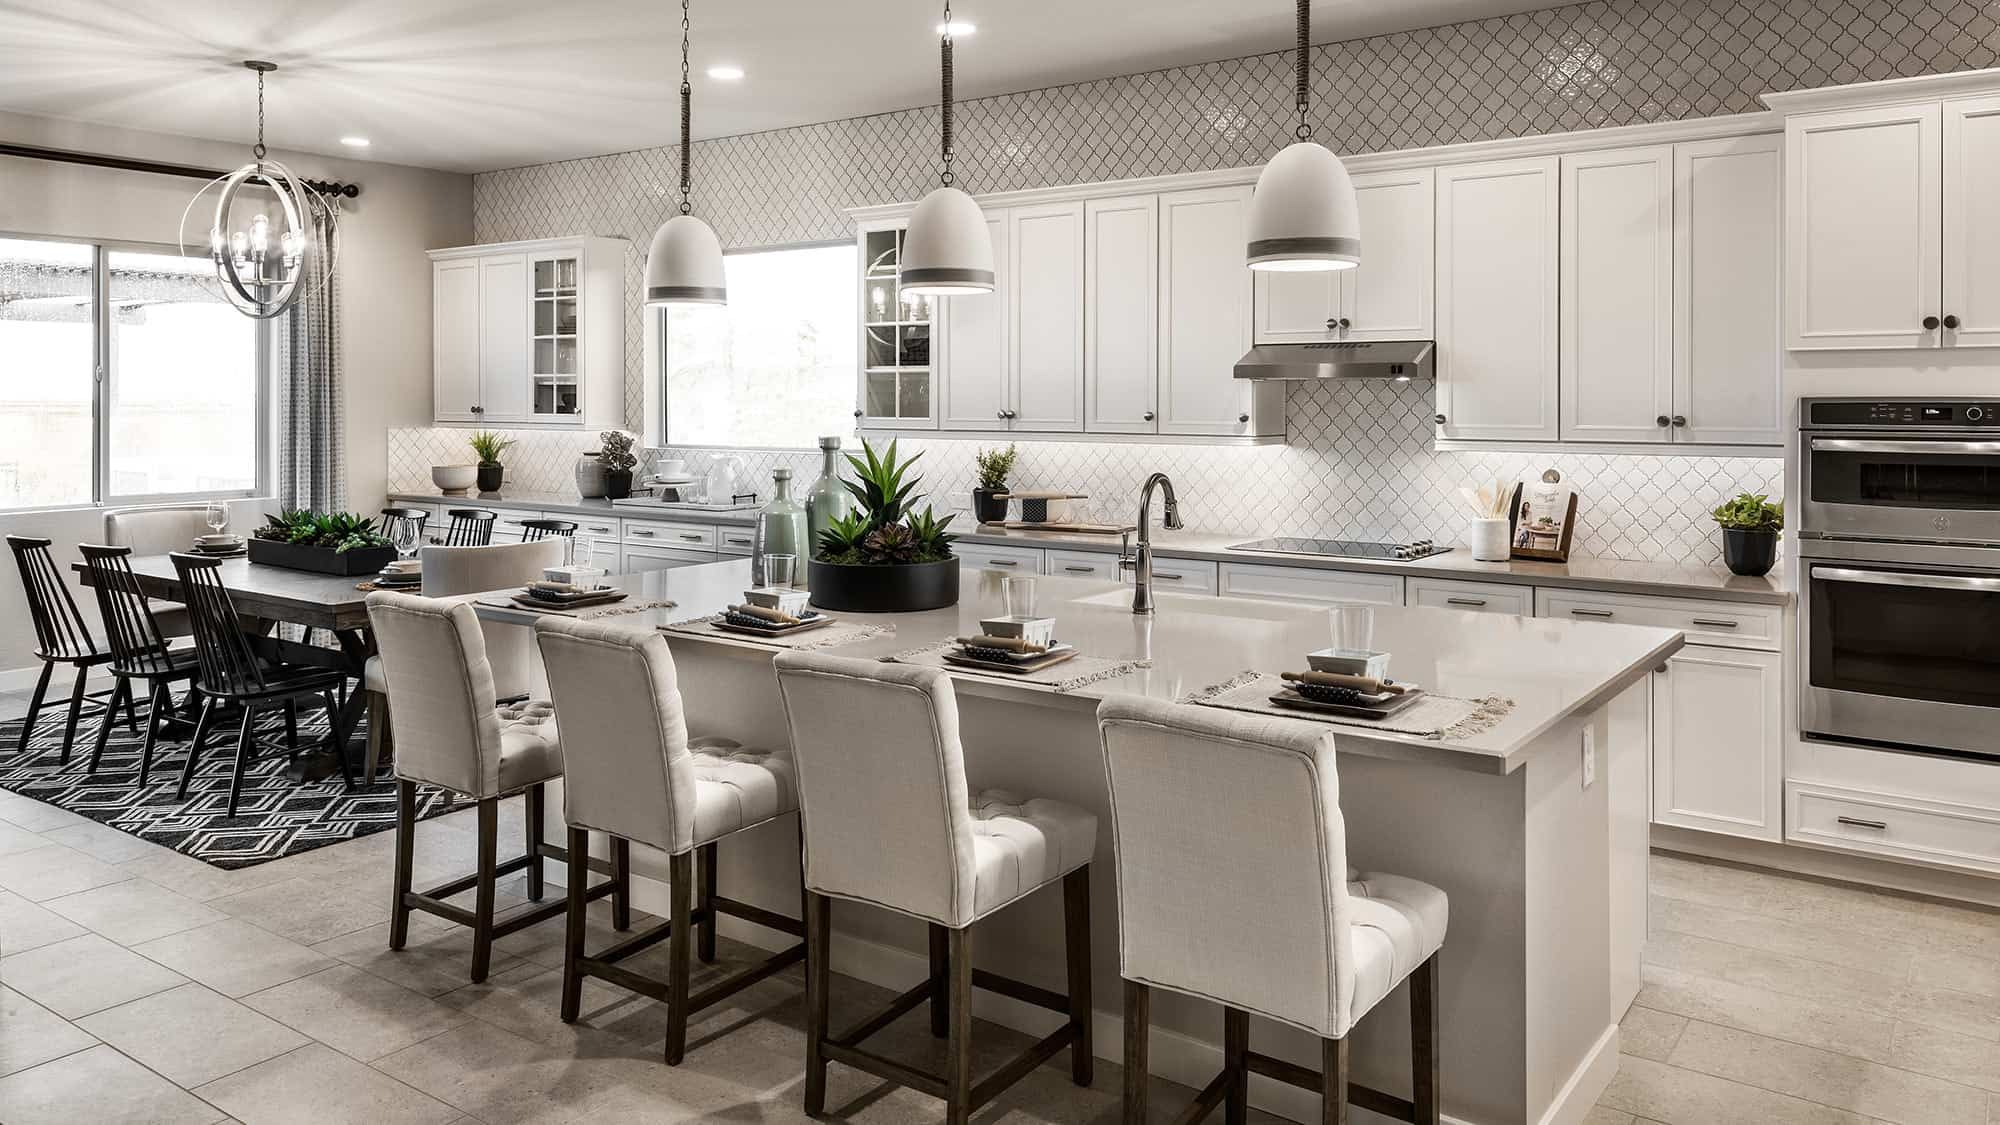 Kitchen featured in the Tucker By Tri Pointe Homes in Phoenix-Mesa, AZ